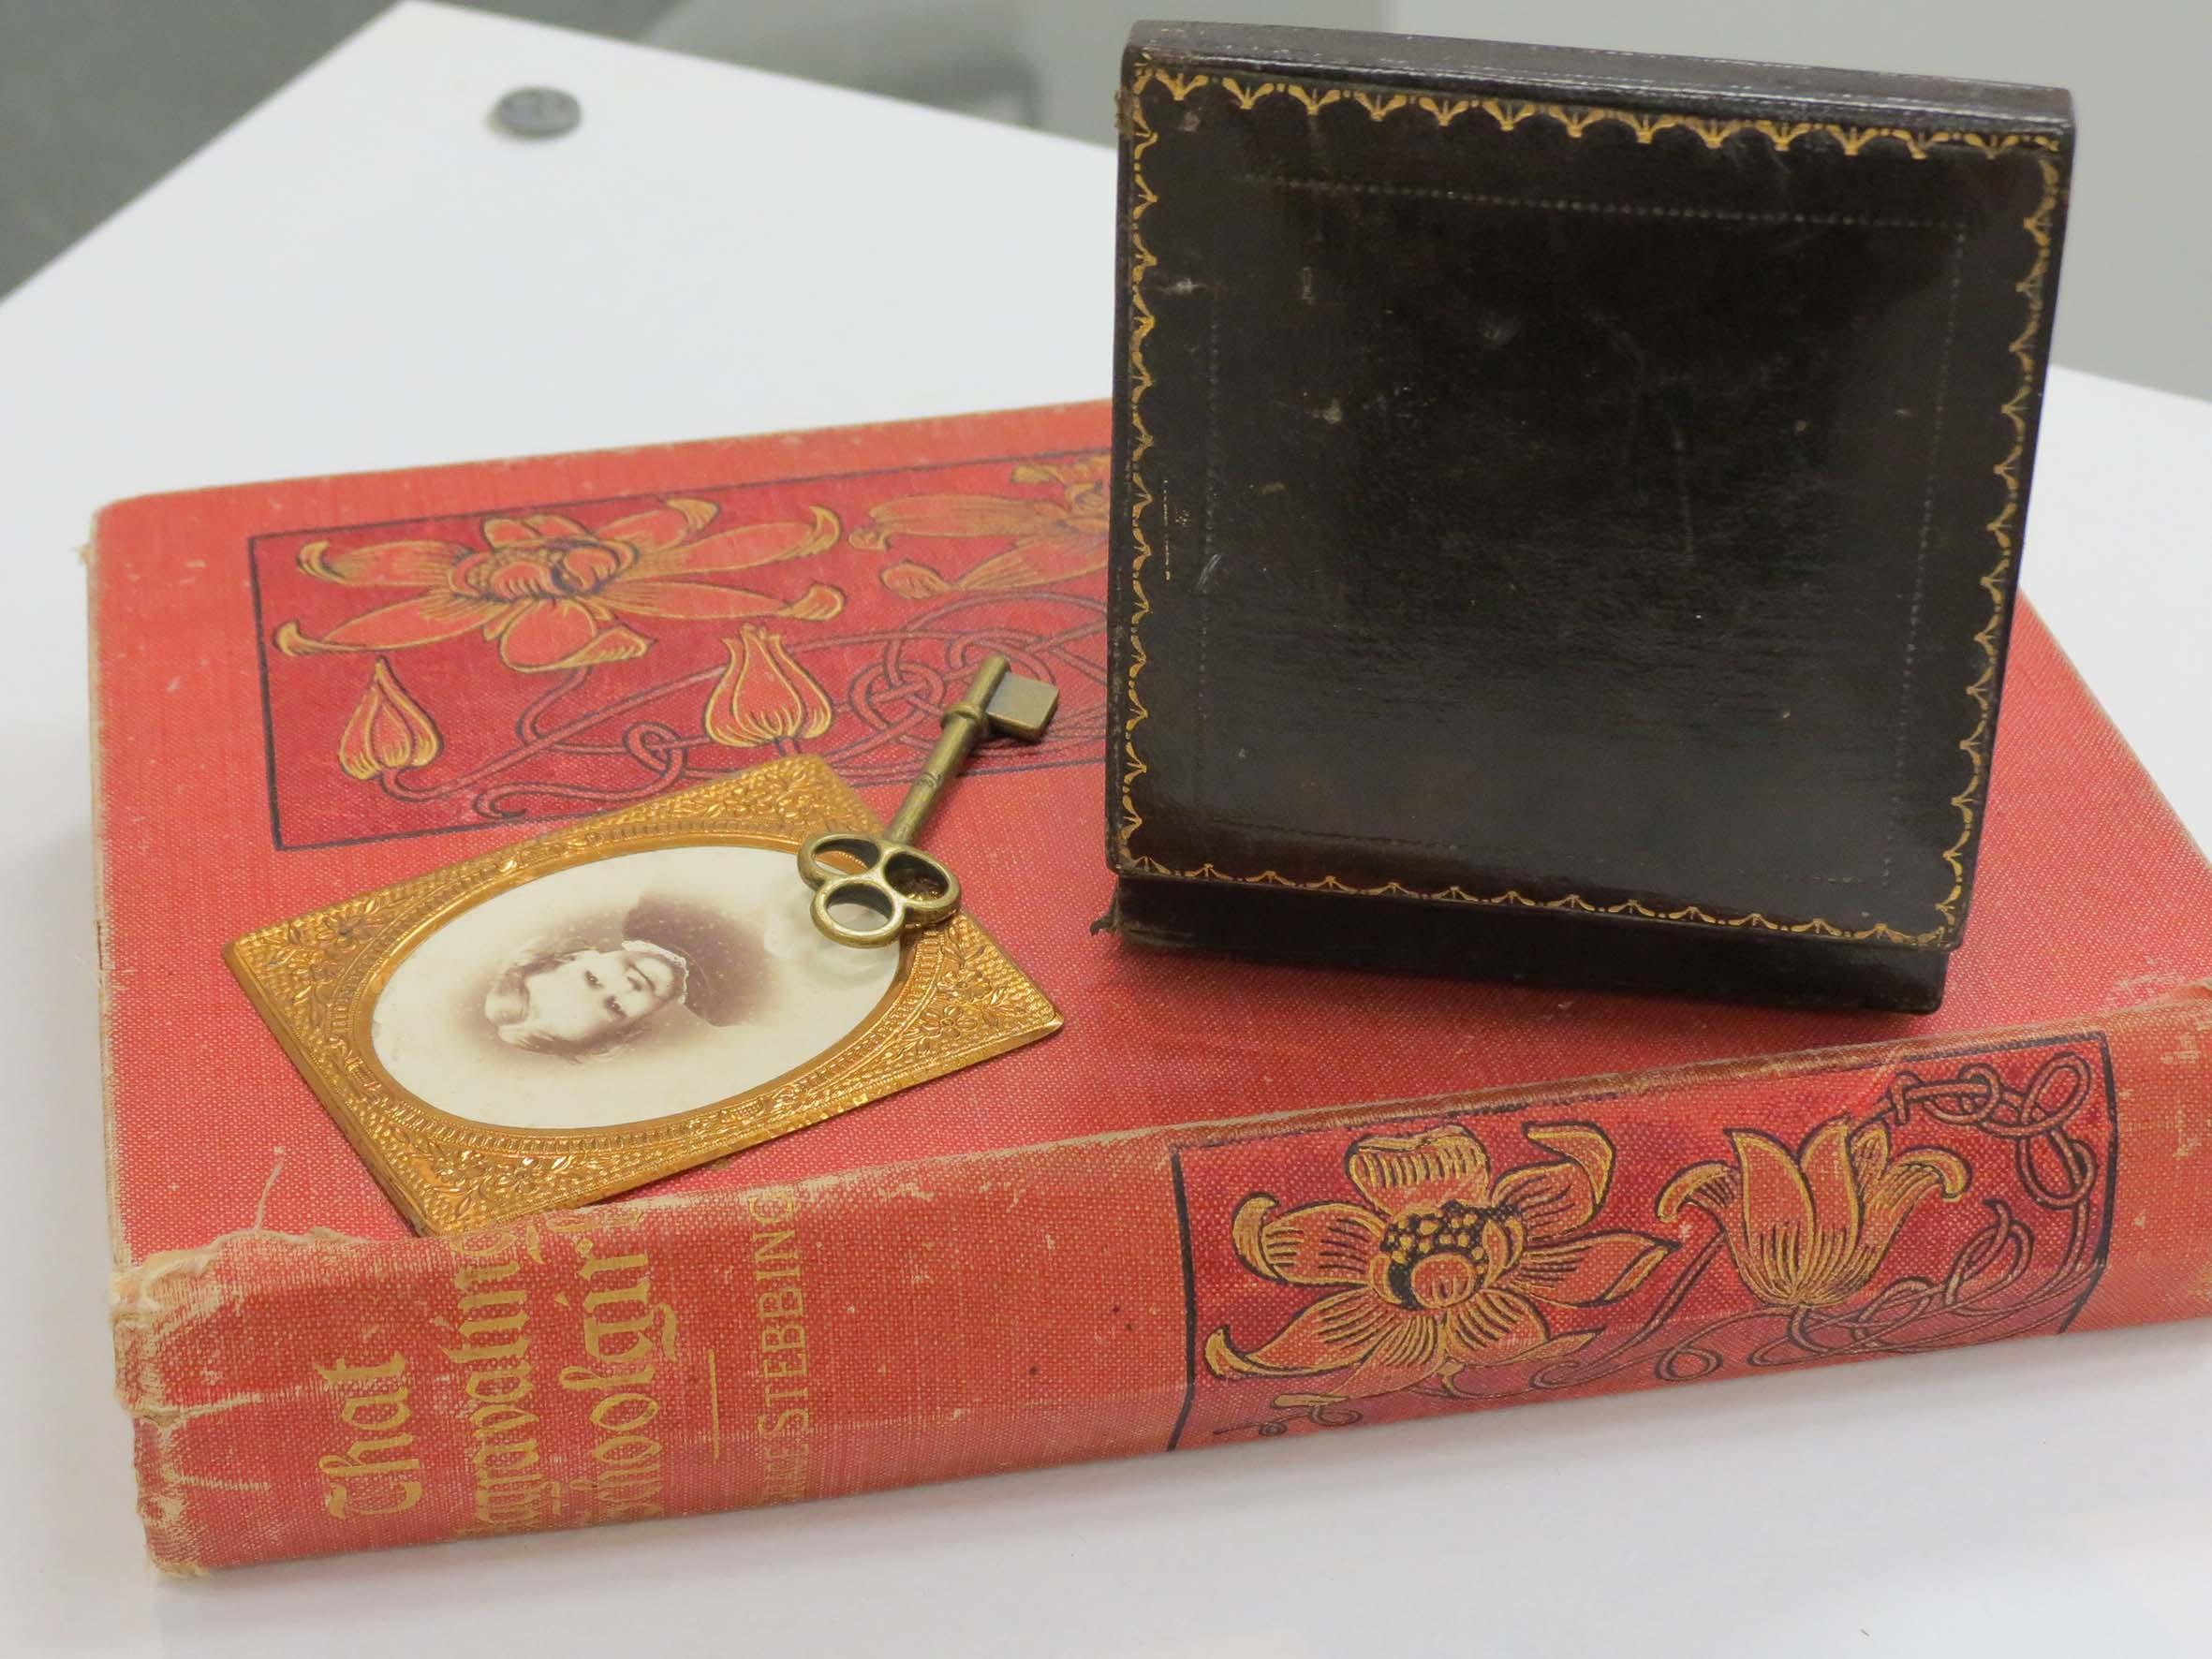 30. Kathy Aspinall, 'Mrs Stewart Dawson', 2012, book, box, enamel on fine silver brooch, key, vintage photograph, altered book, $500